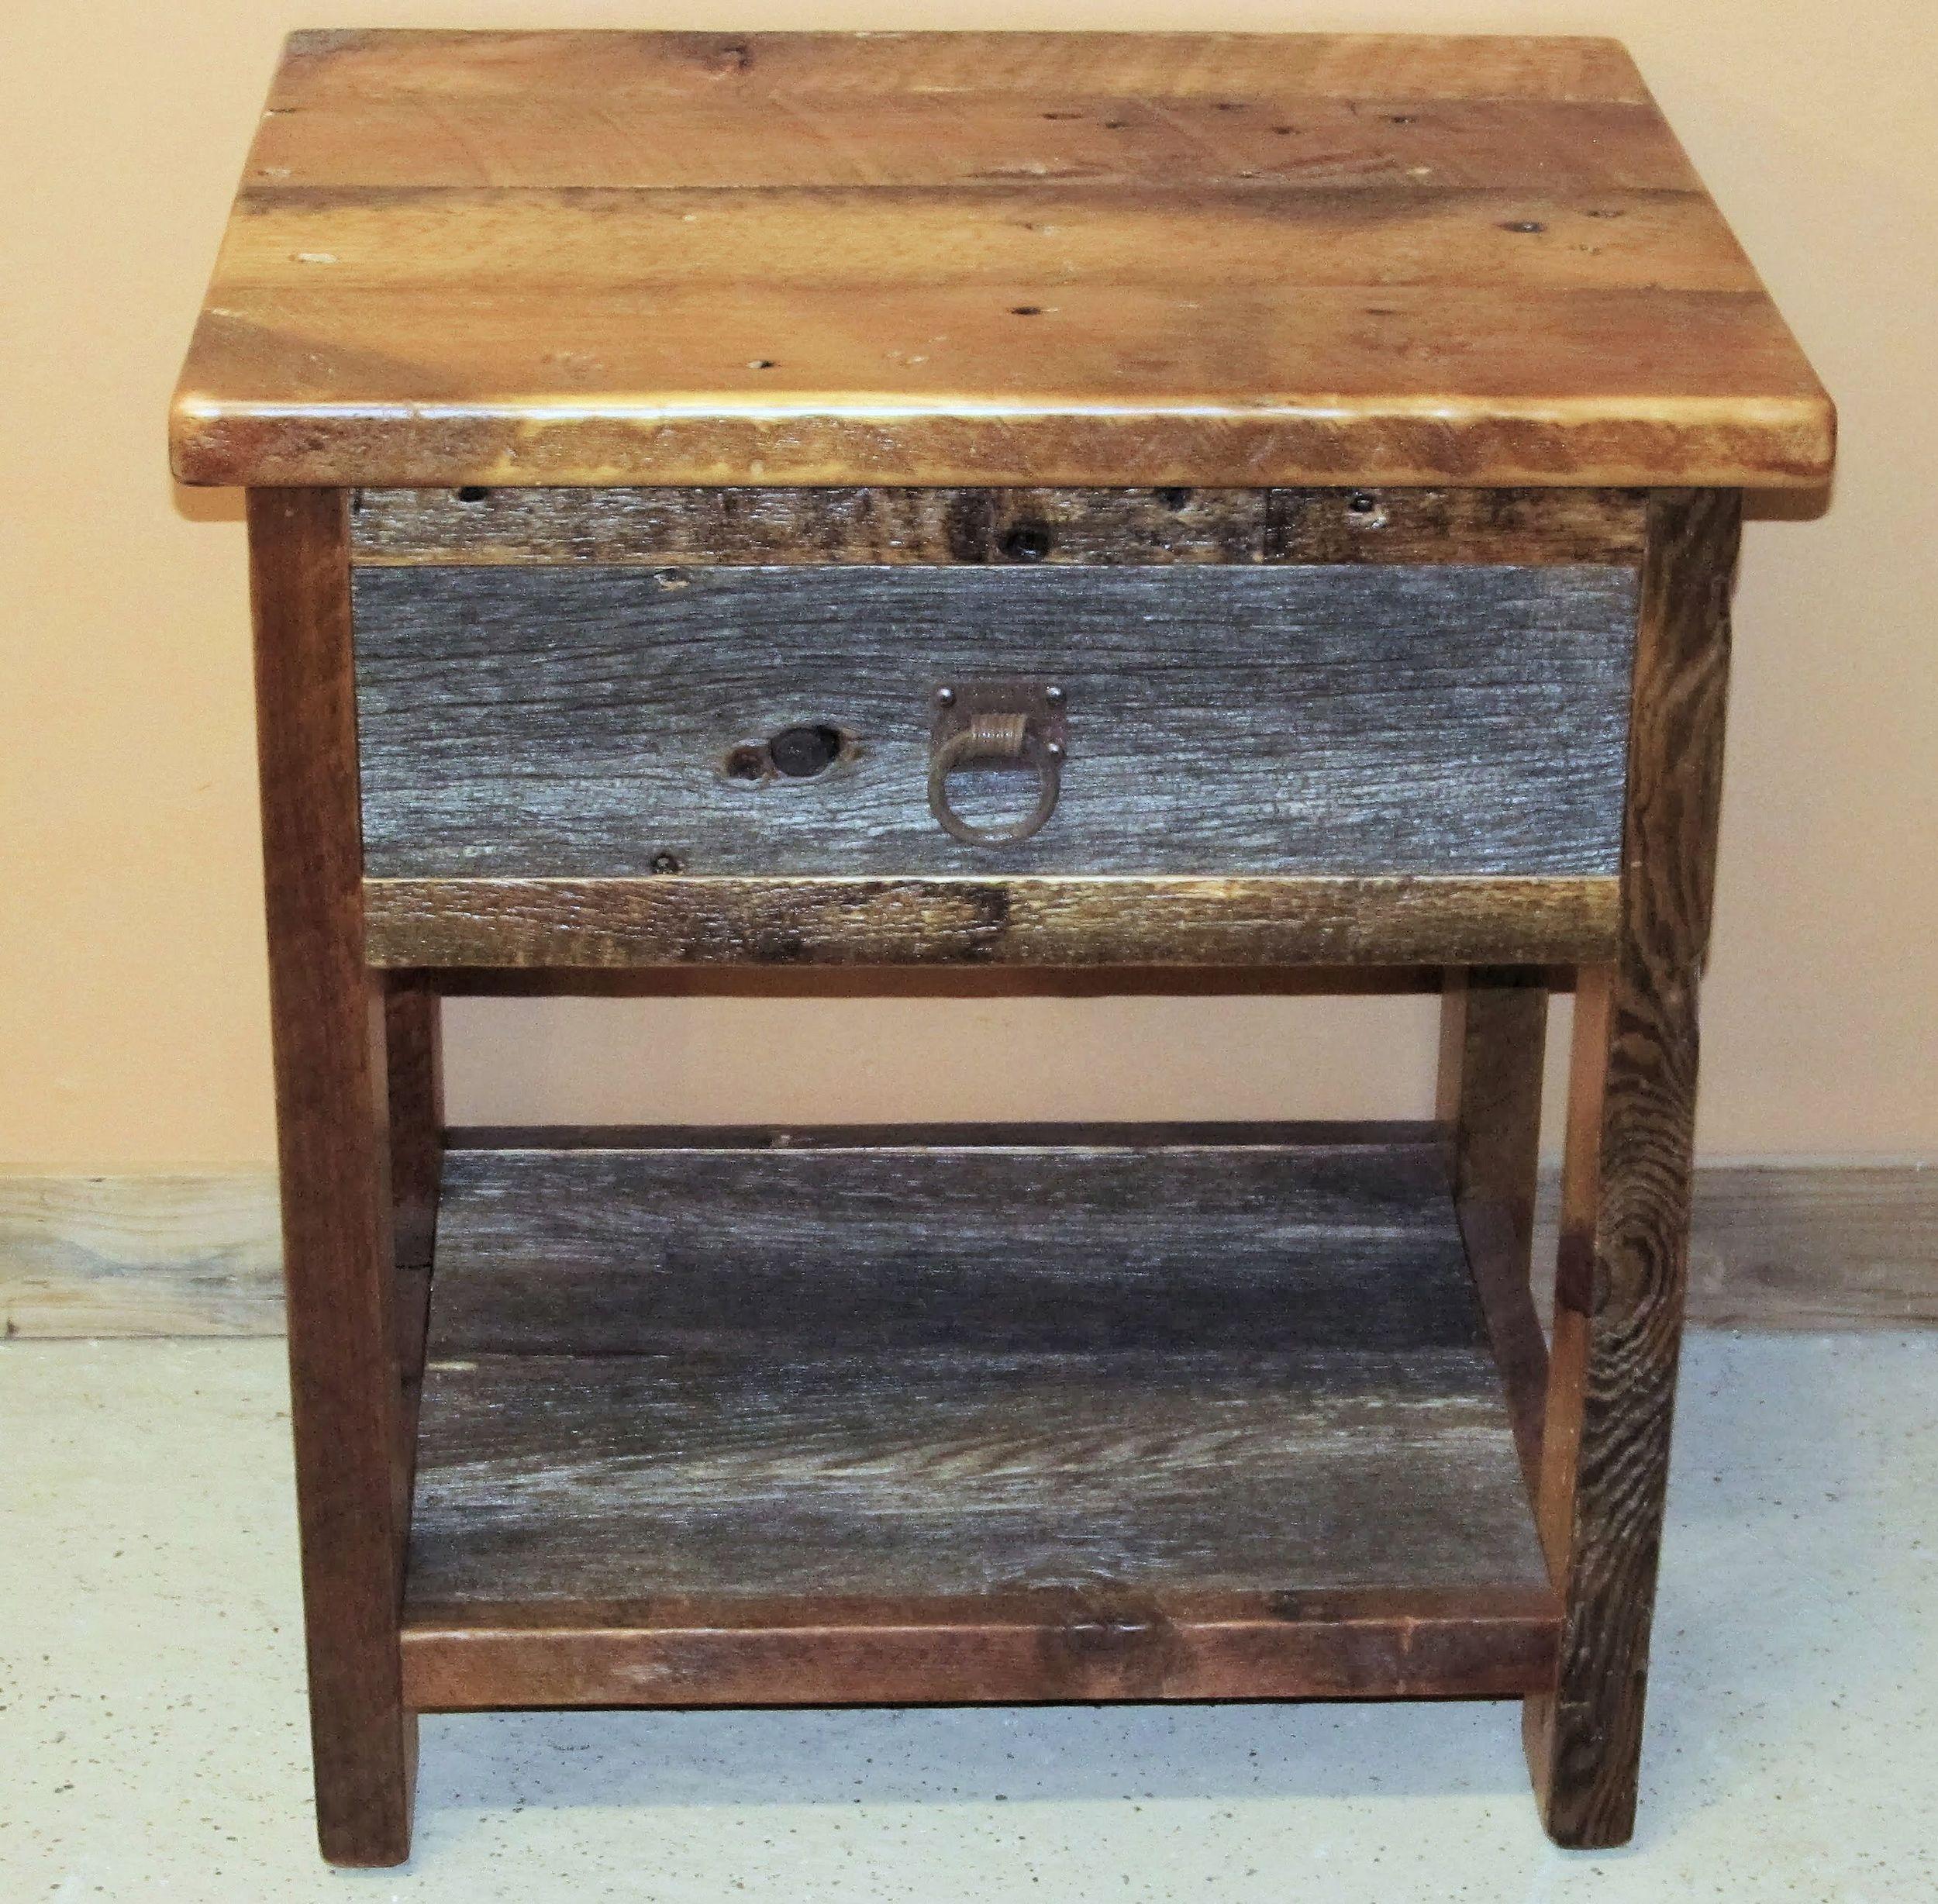 Barn Wood Nightstands End Tables Barn Wood Furniture